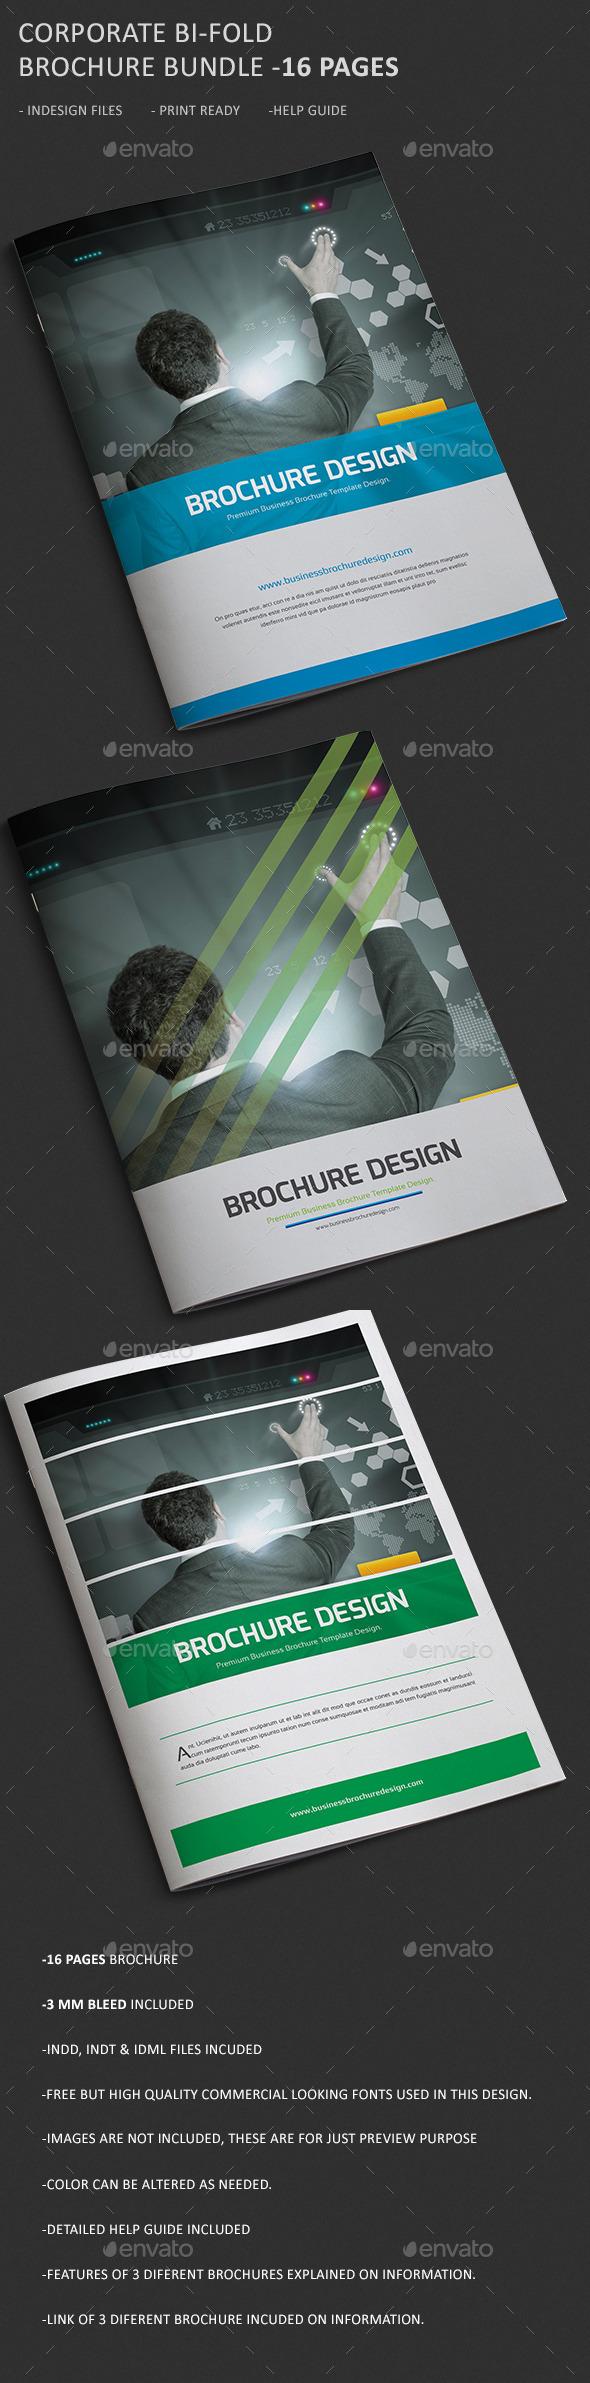 Corporate Business Brochure Bundle. - Corporate Brochures